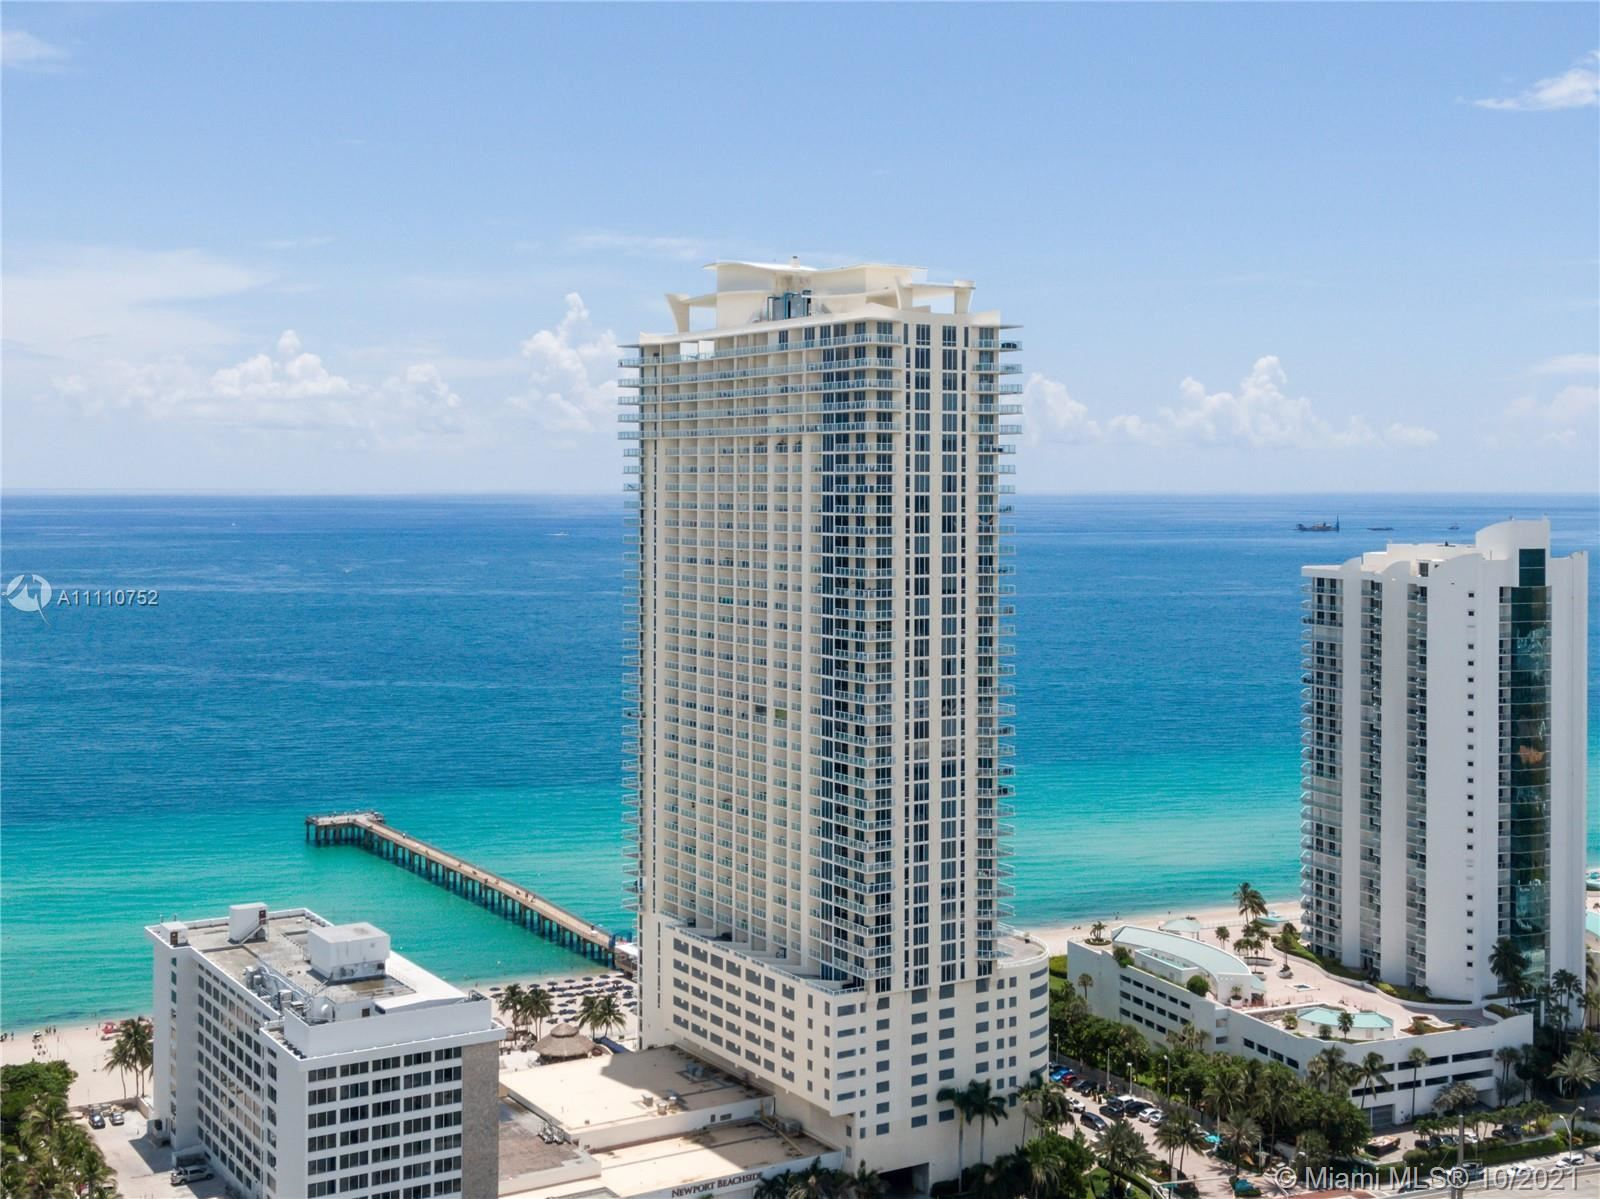 Photo of Sunny Isles Beach, FL 33160 (MLS # A11110752)